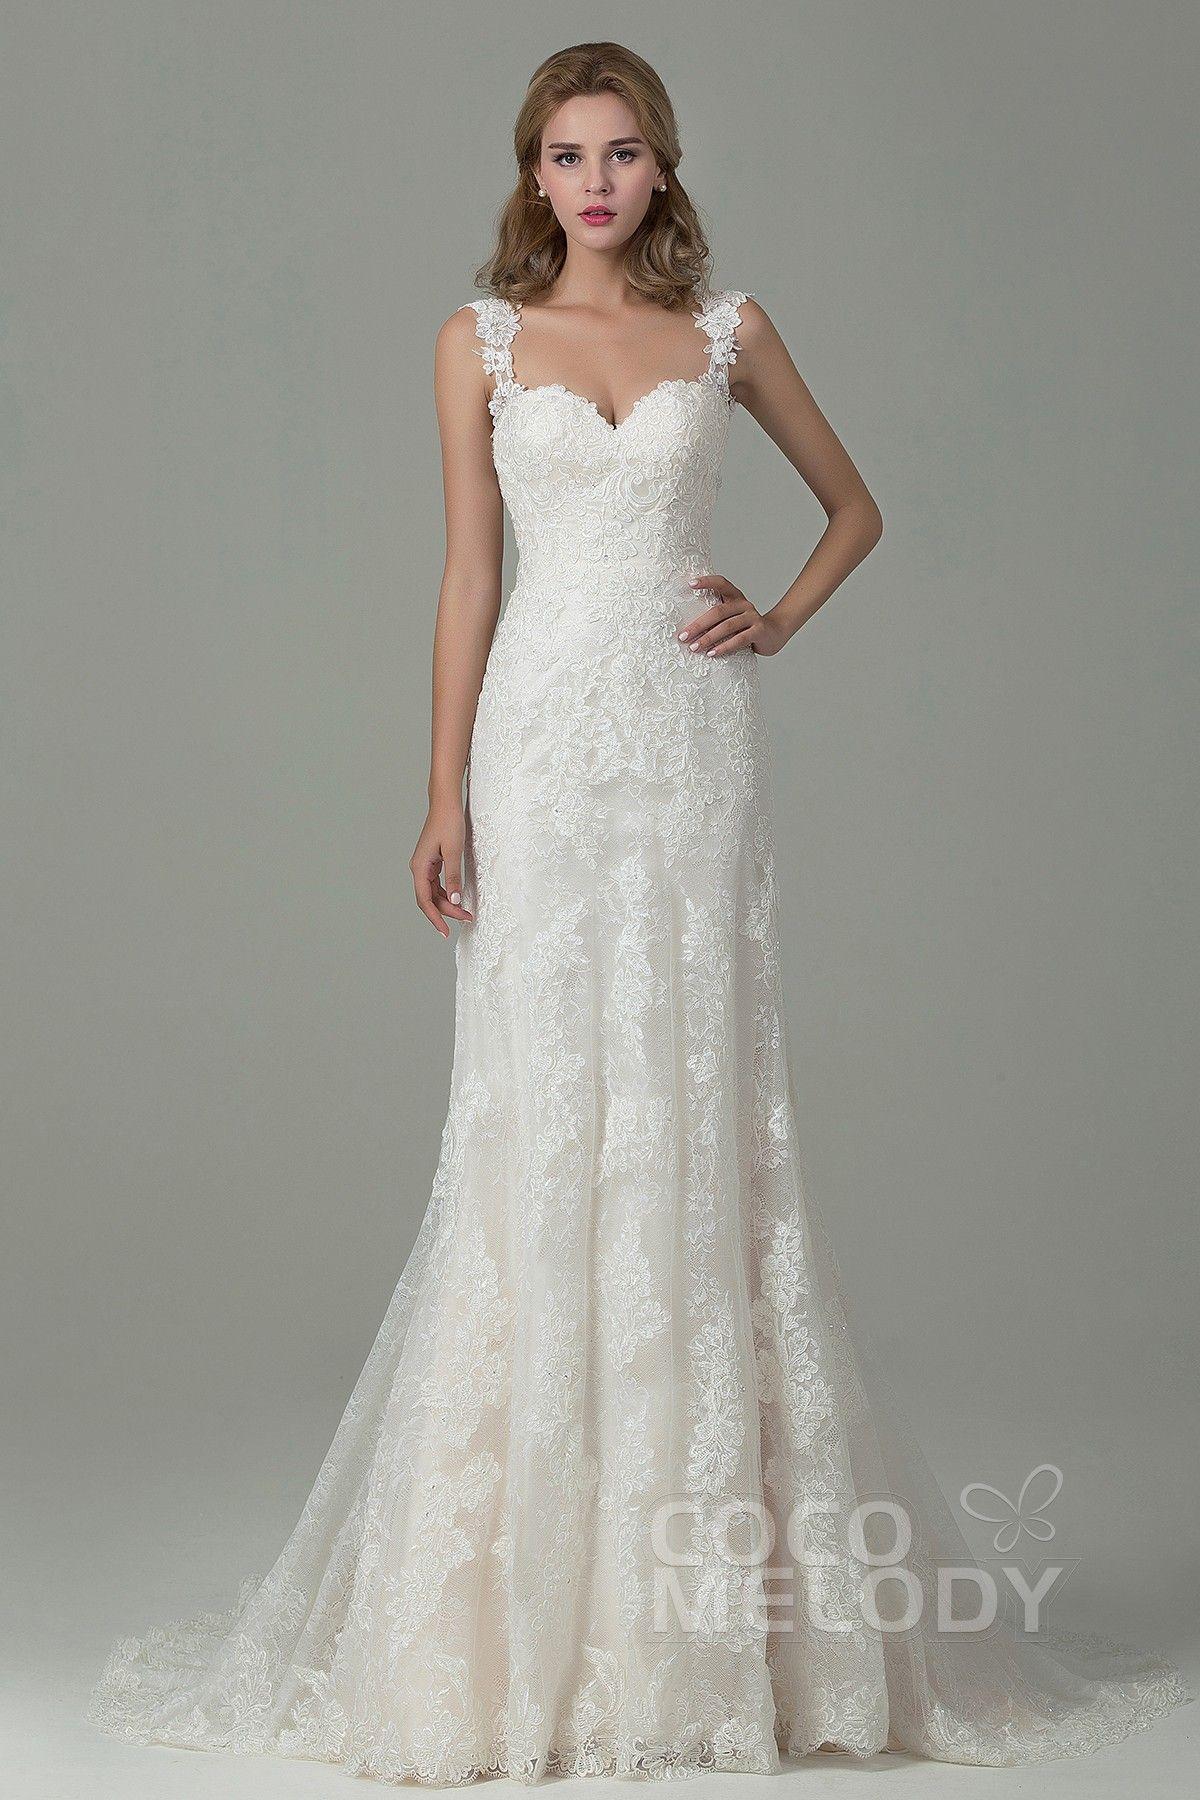 SheathColumn Court Train Lace Wedding Dress with Appliques CWVT15002  My Fairytale Wedding